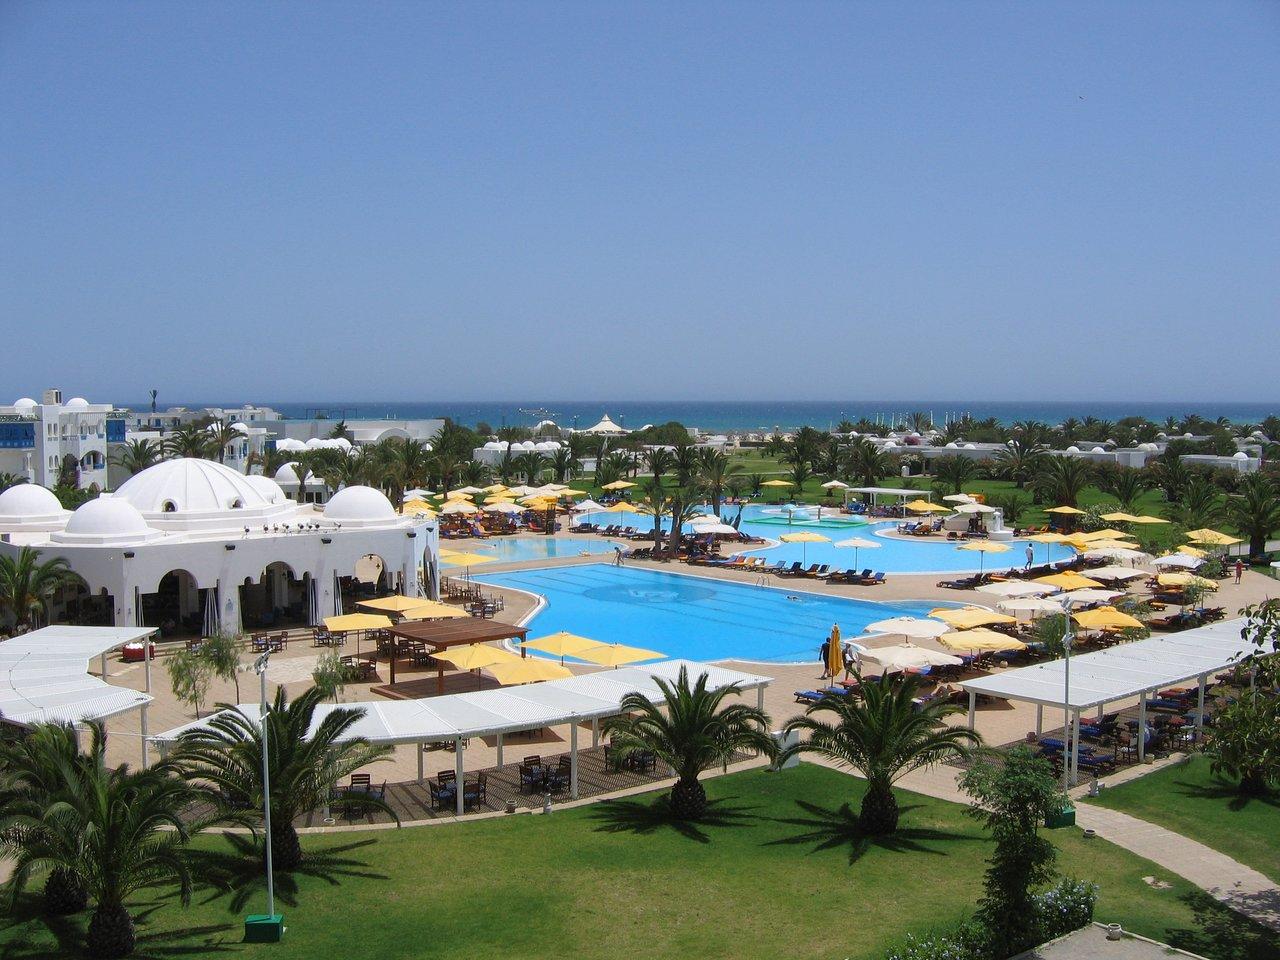 Club Med Hammamet Tunisia All Inclusive Resort Reviews Photos Price Comparison Tripadvisor